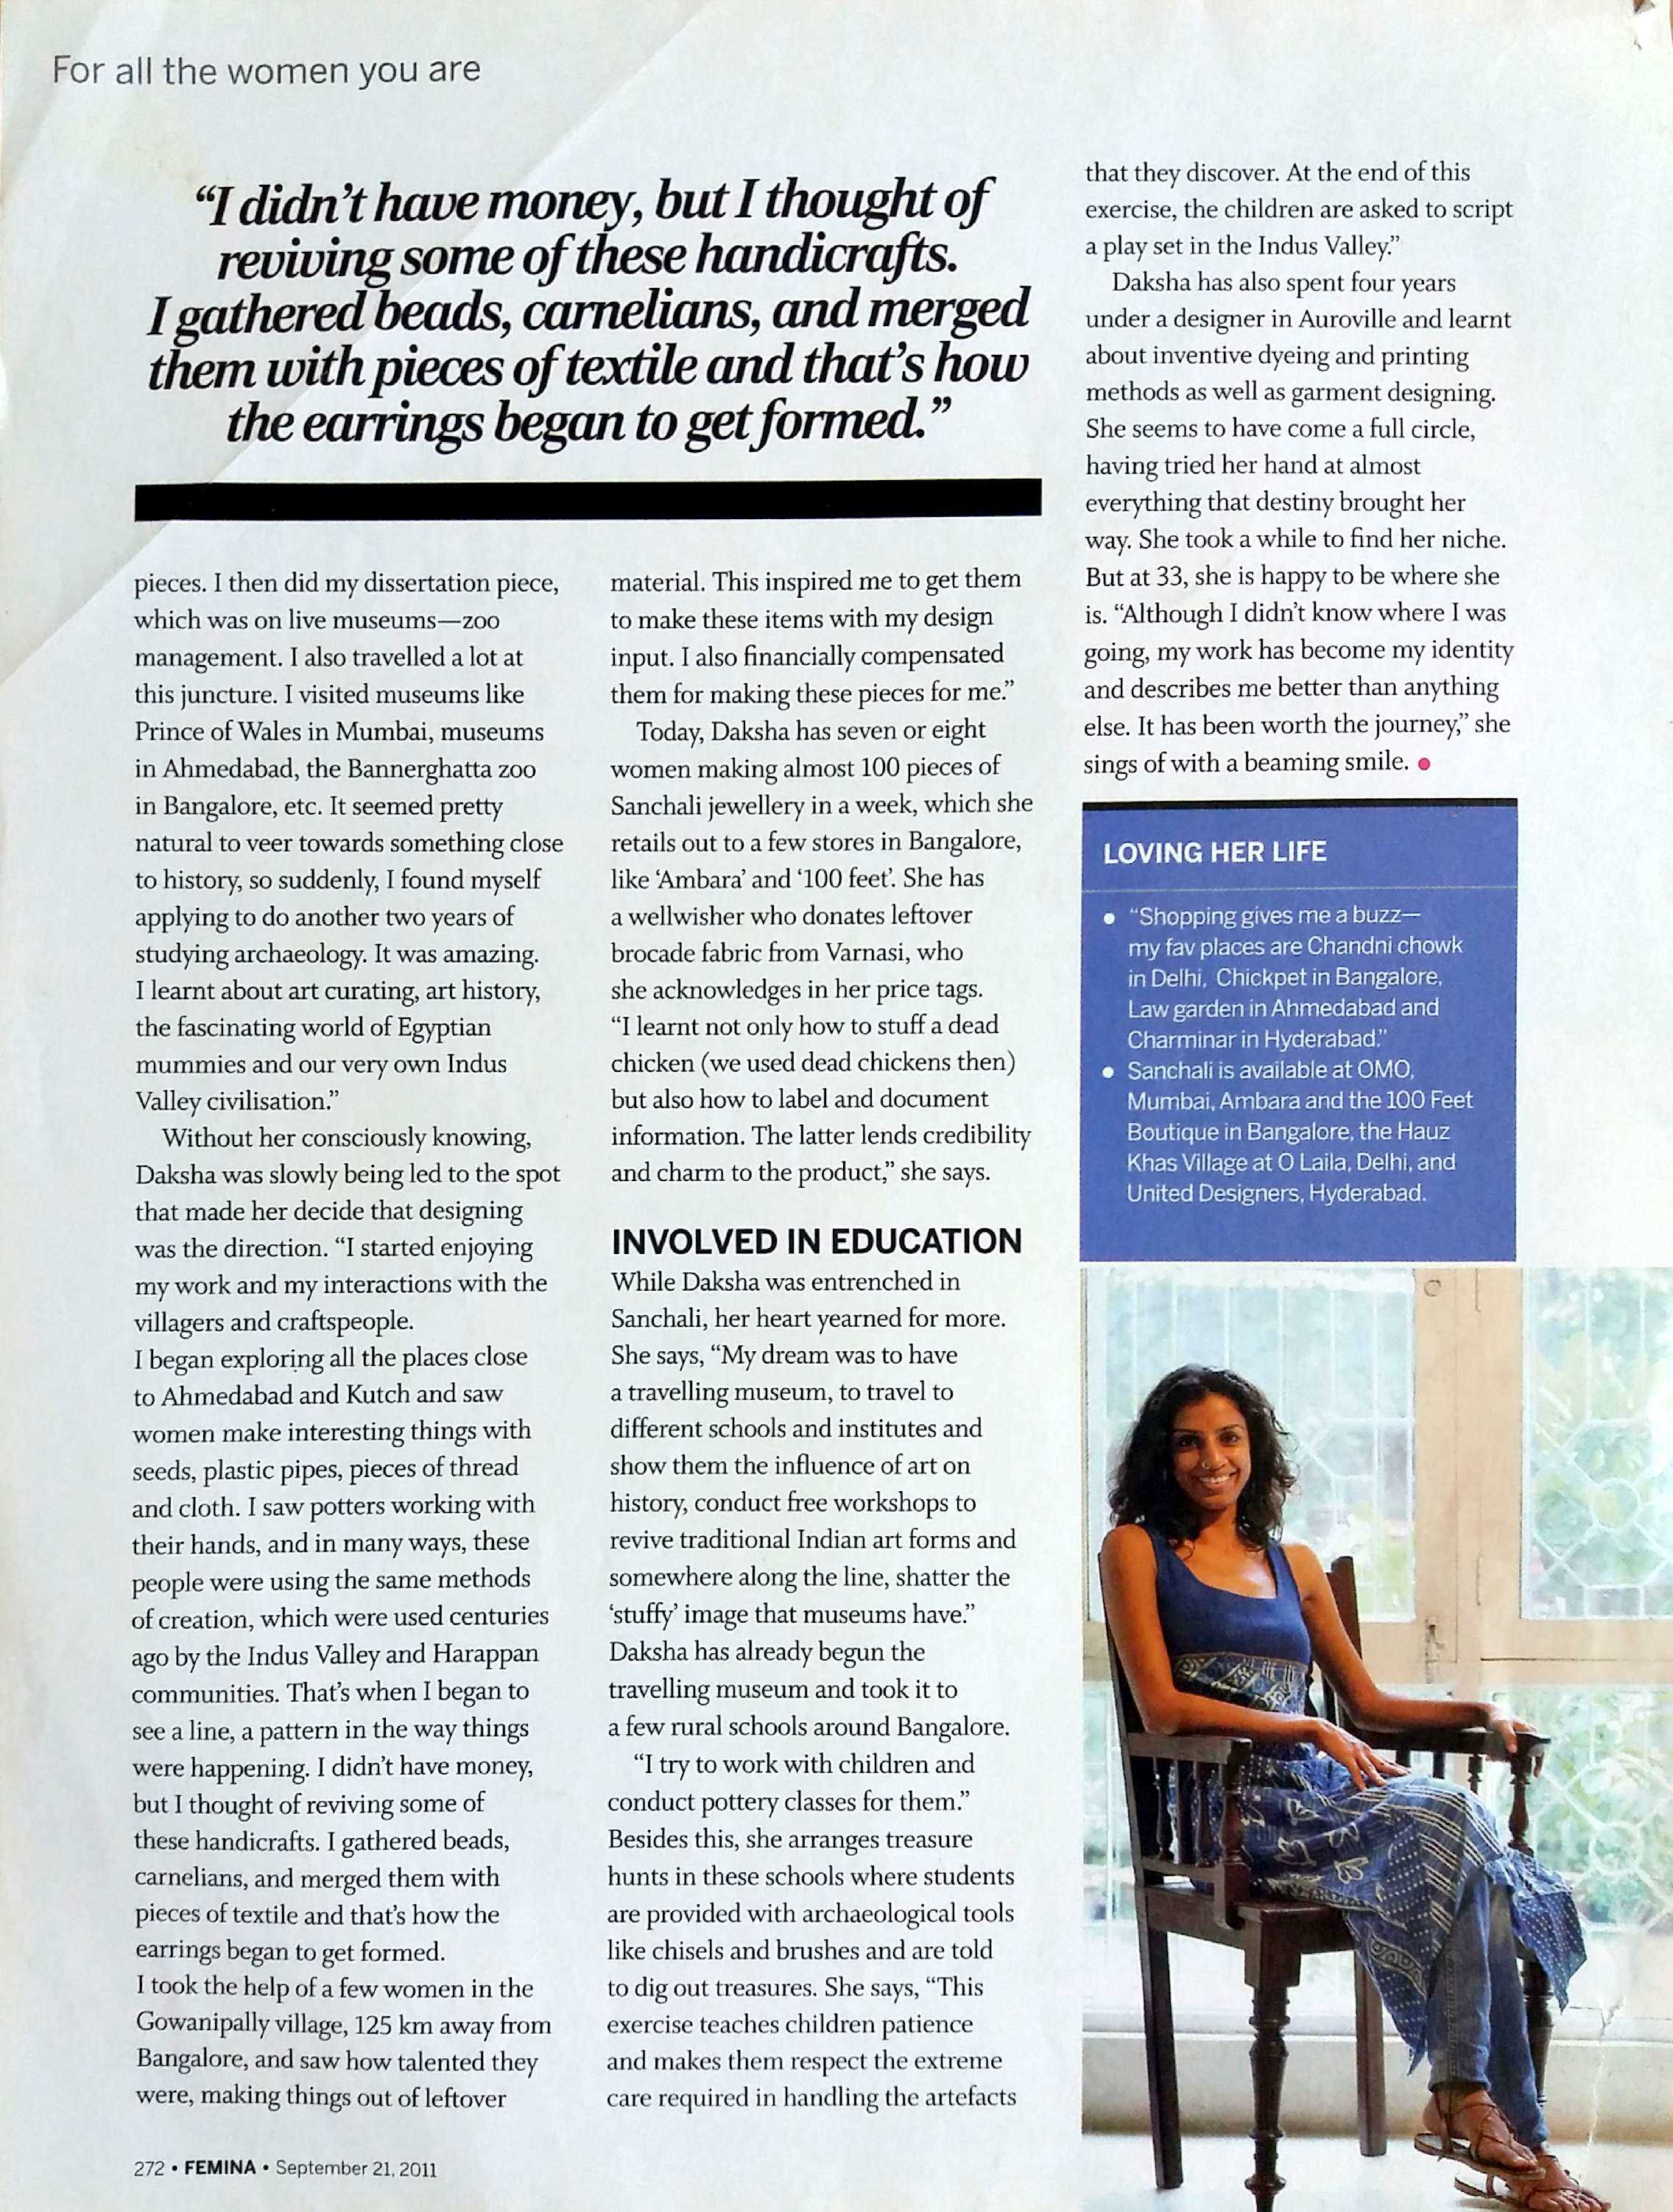 FEMINA, 2011 (page 2)